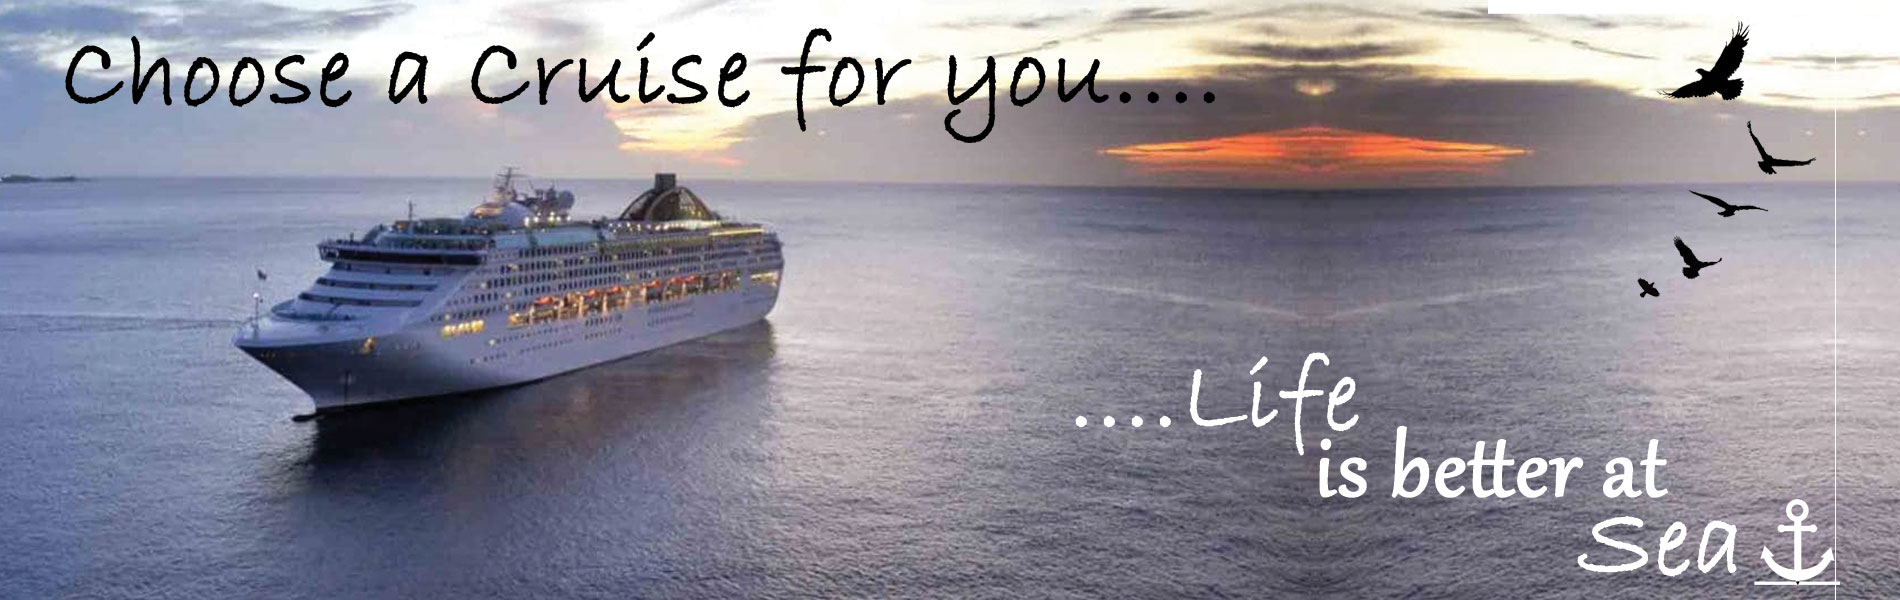 Choose-a-cruise